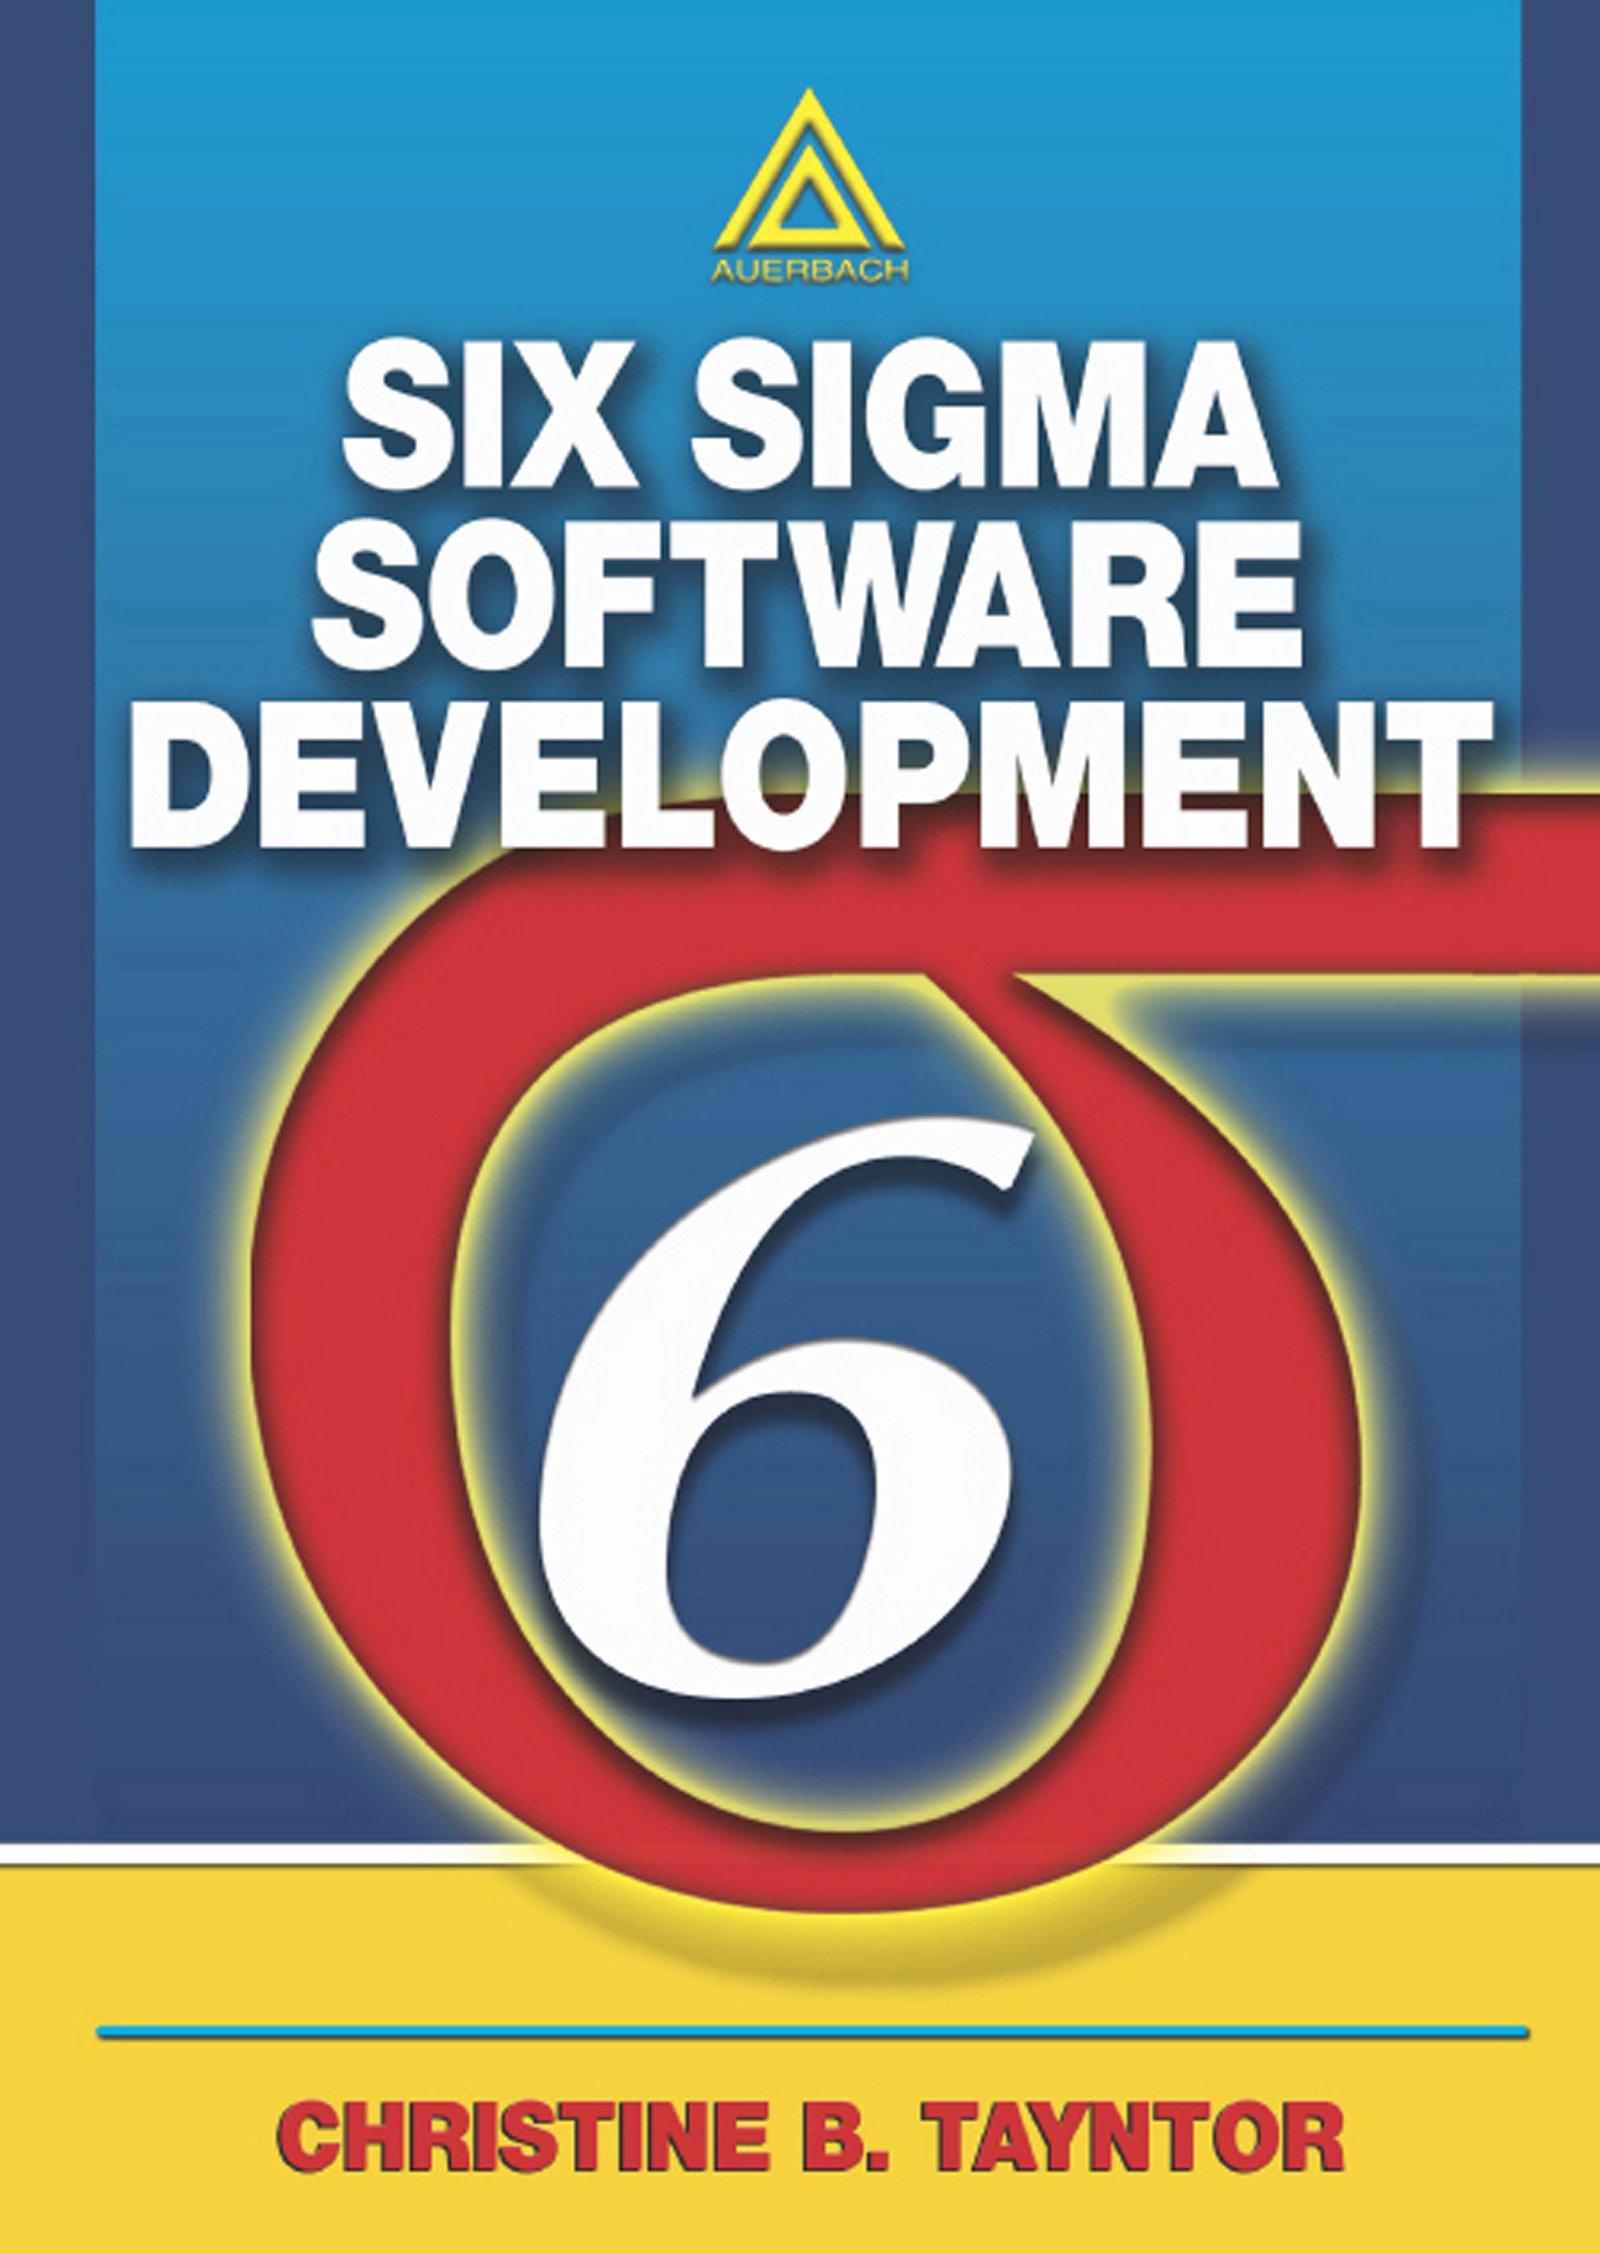 Six Sigma Software Development 1 Tayntor Christine B Ebook Amazon Com